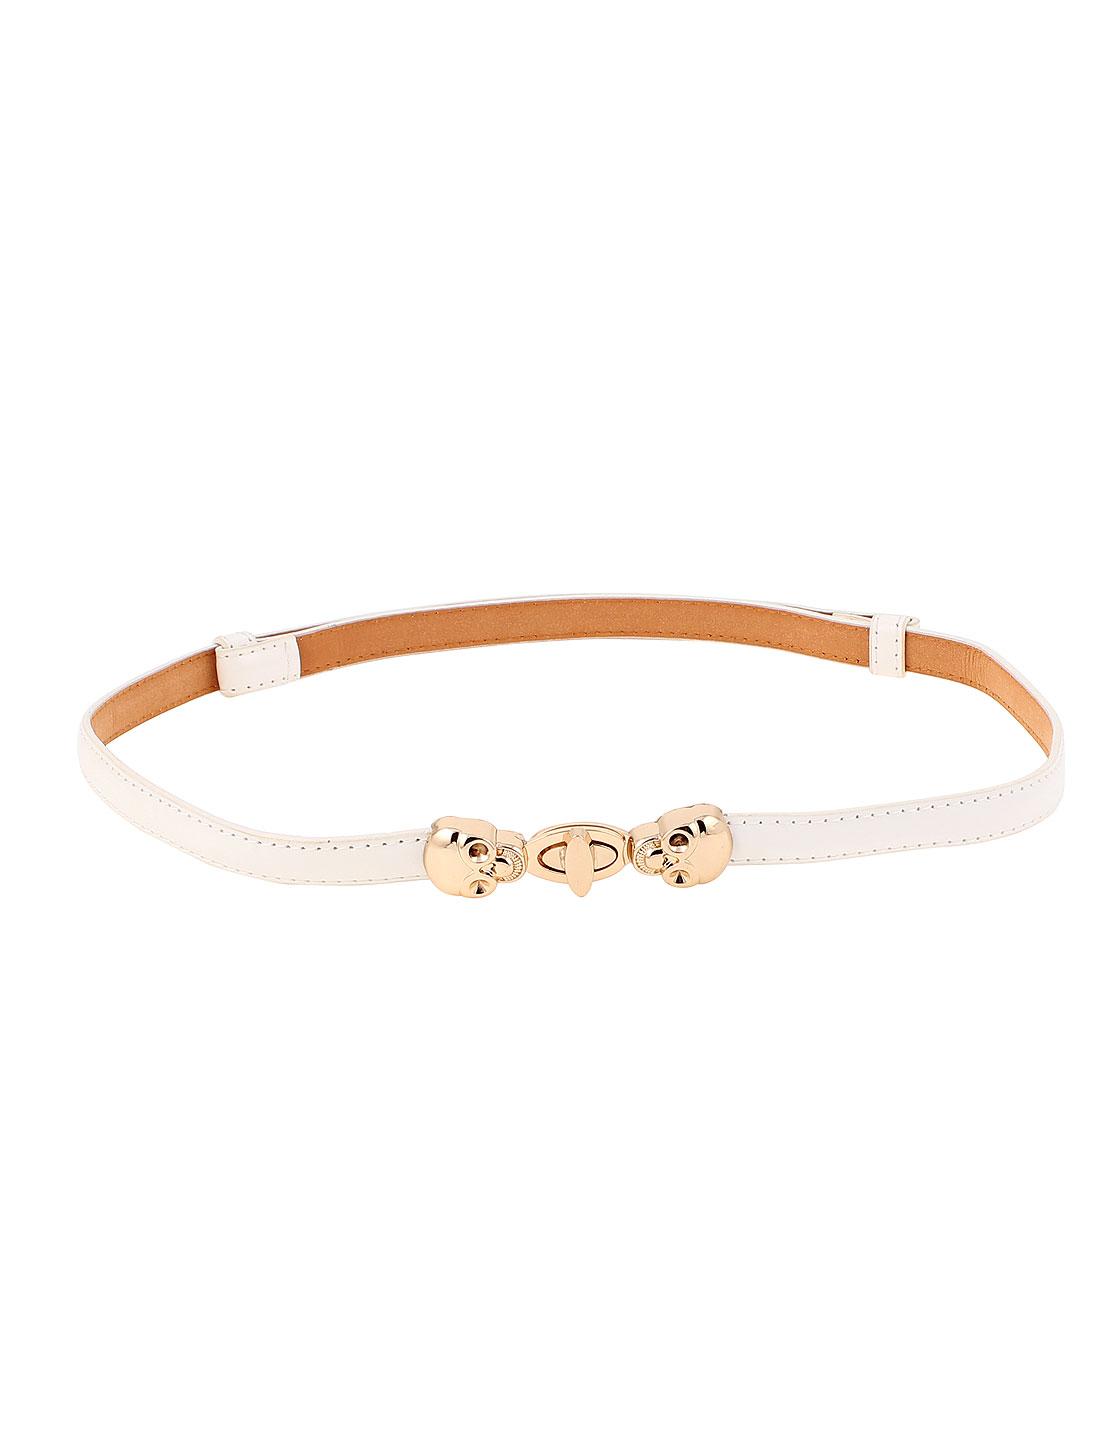 Women Gold Tone Buckle Skinny Leather Cinch Waist Belt White